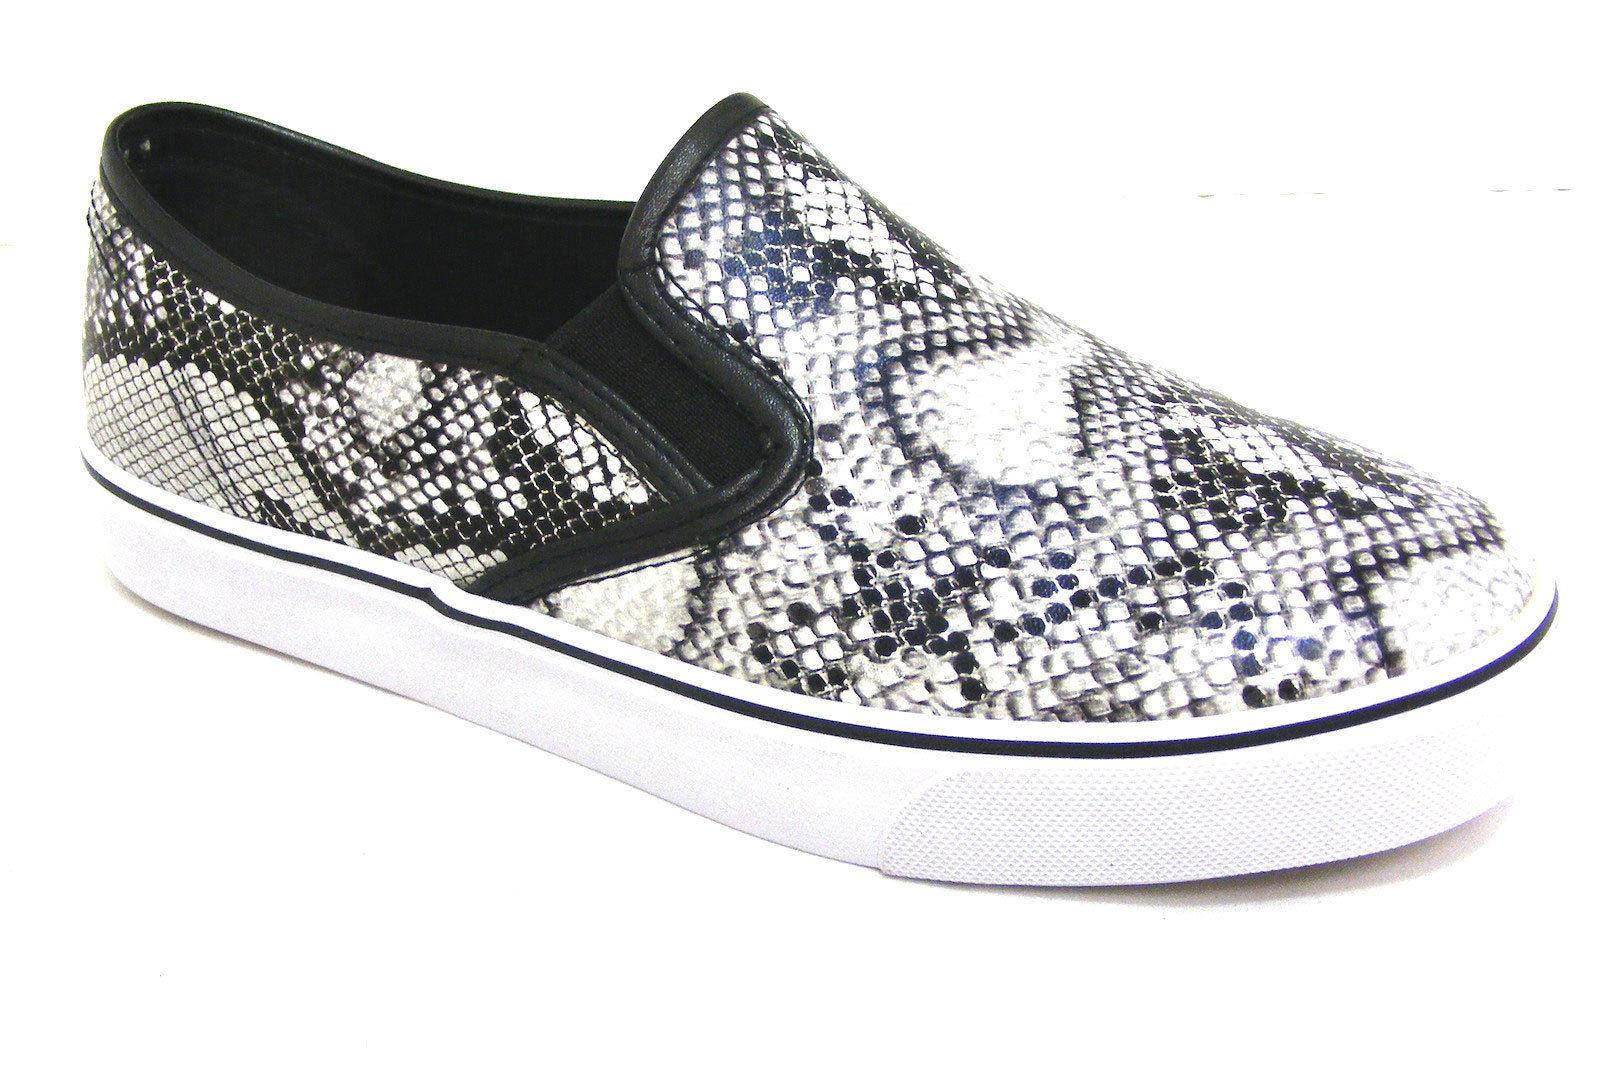 Señoras Para Mujer Chicas Plana Slip On Skater Gimnasio plimsolls formadores Bombas Zapatos Talla